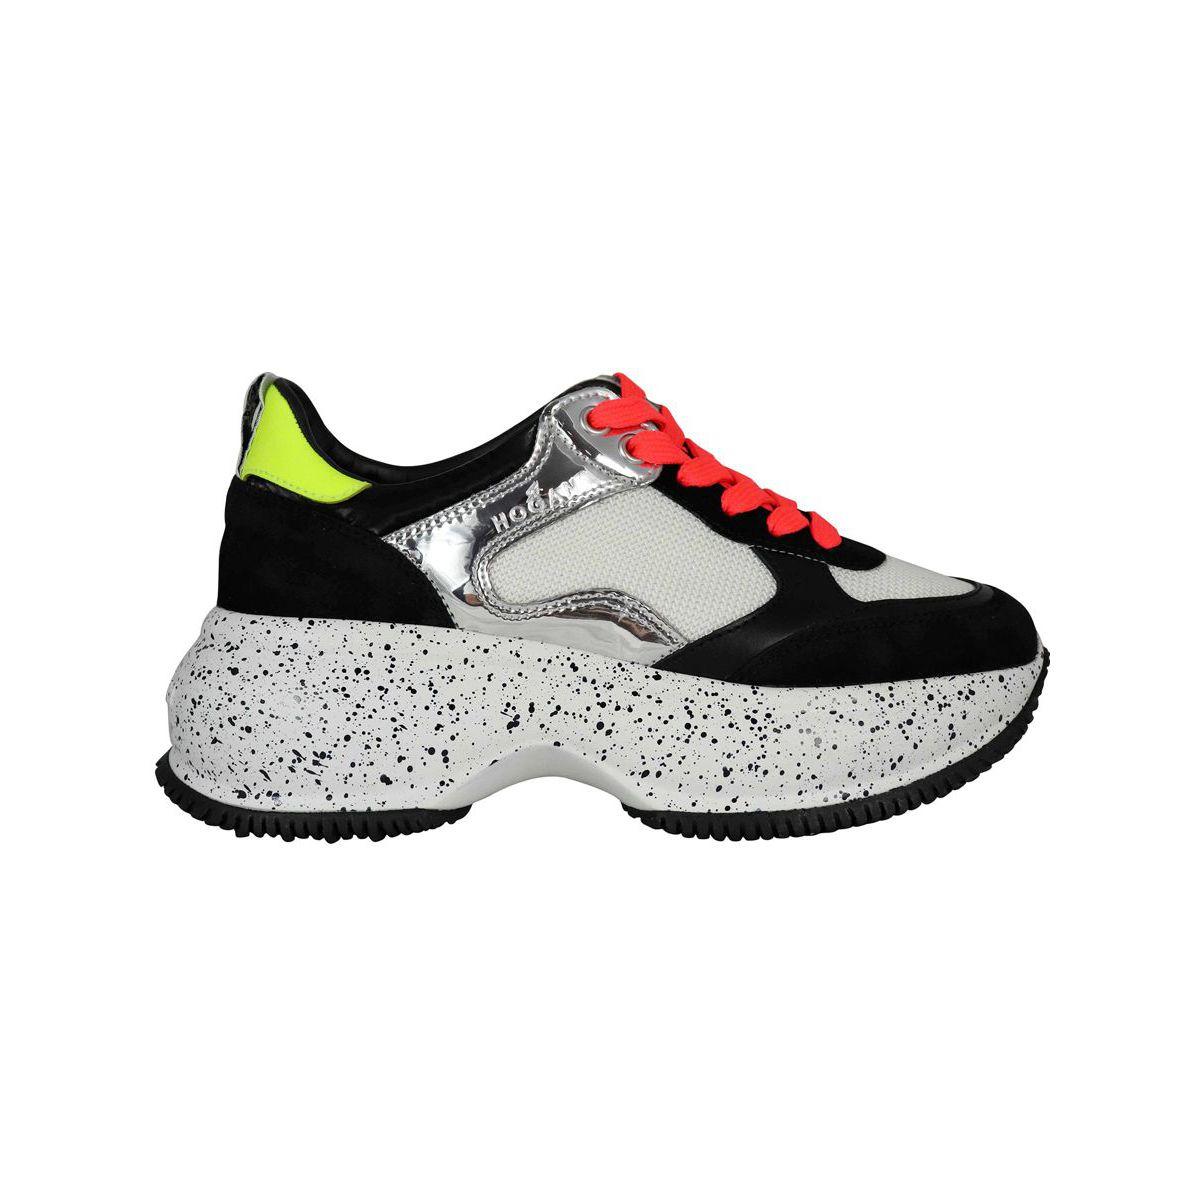 Maxi Active Marble H465 Sneakers Black / b.co Hogan